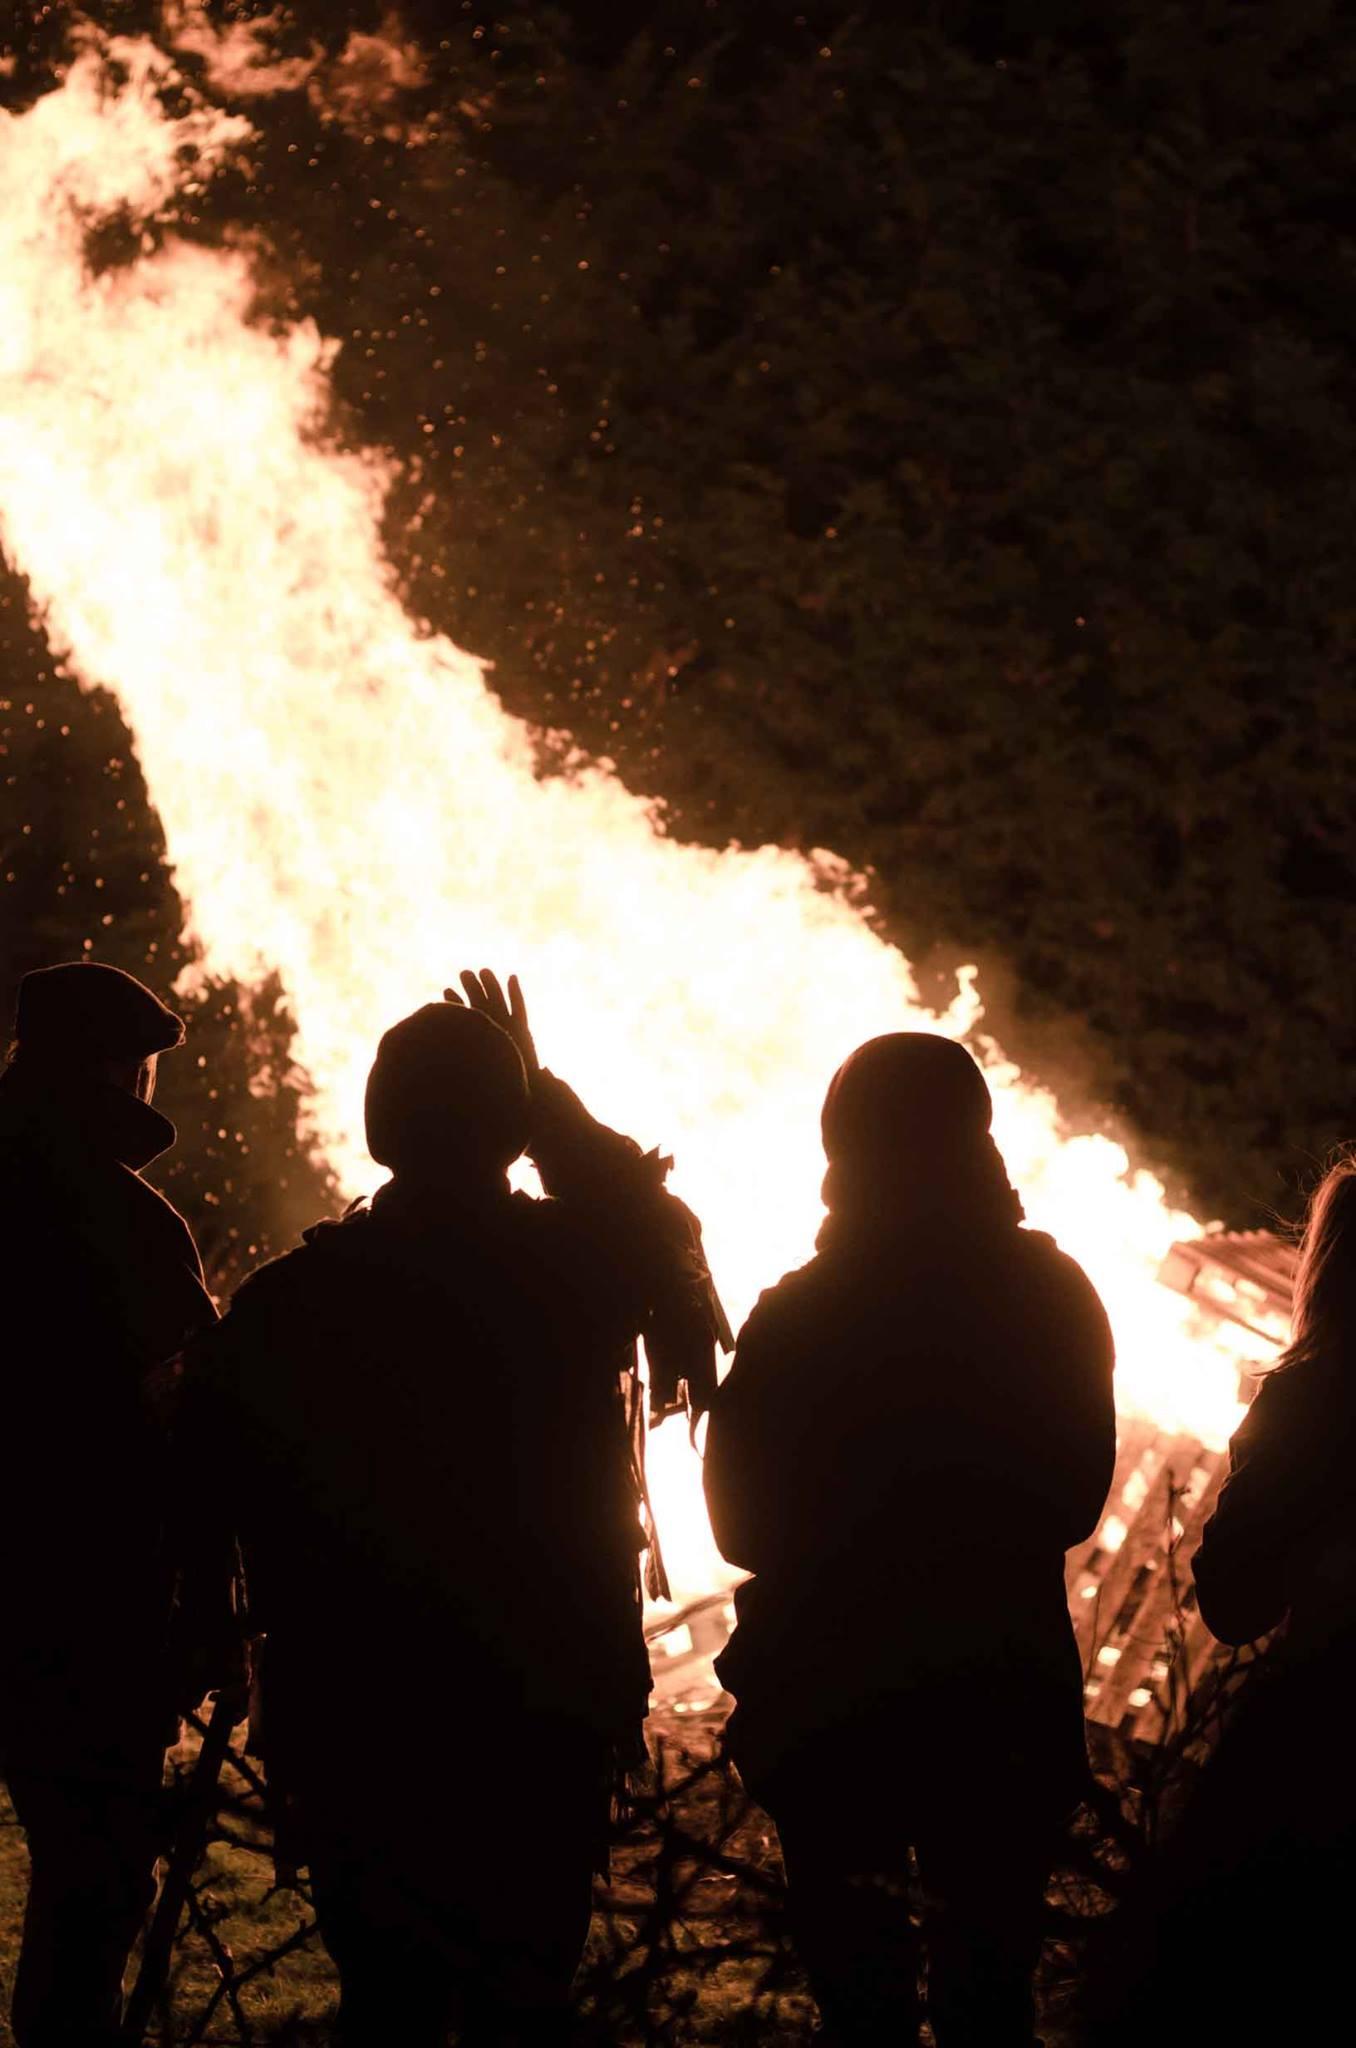 Crowding around the bonfire.